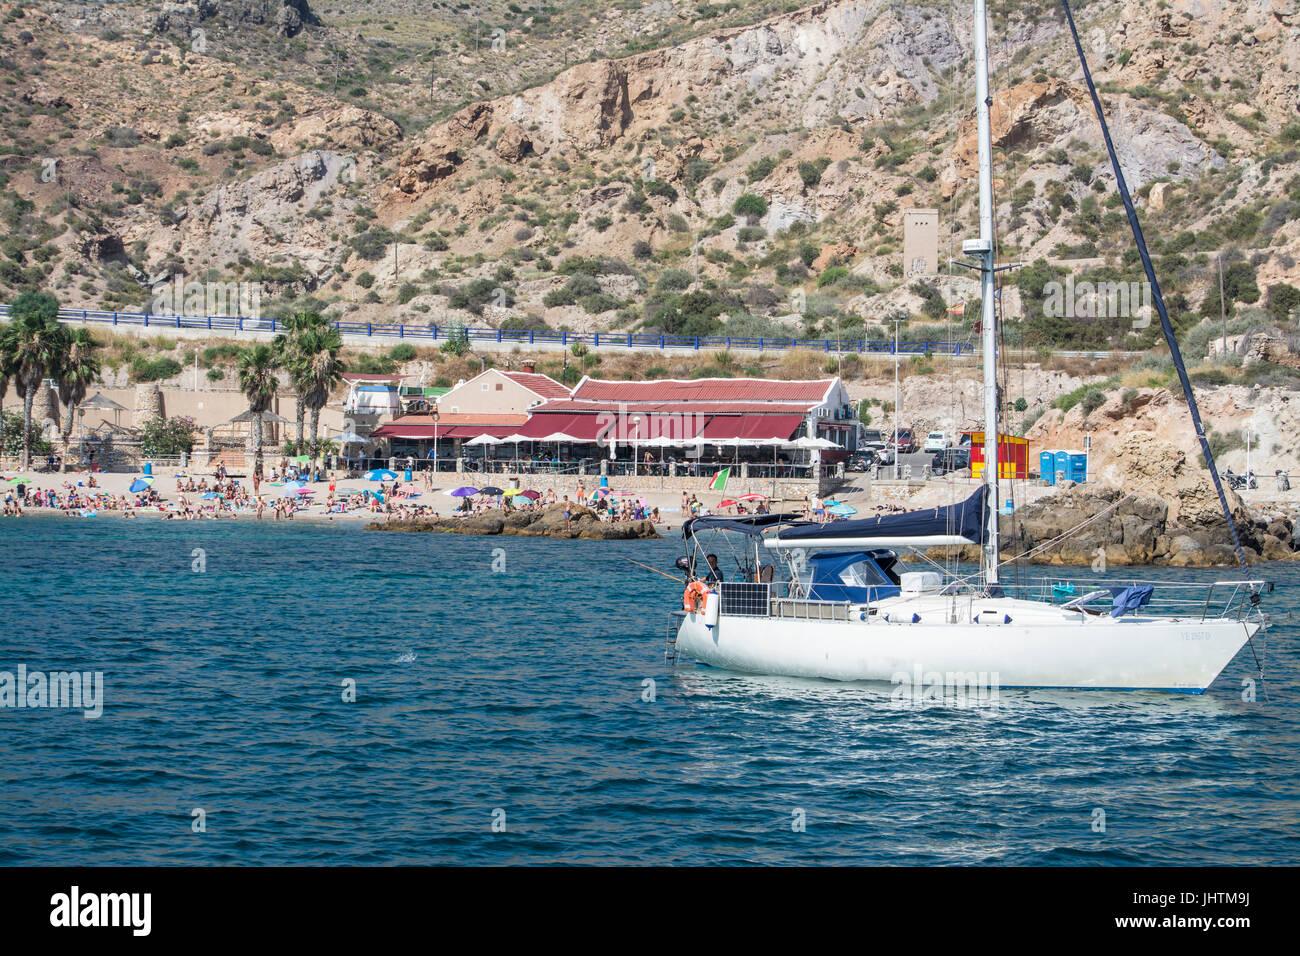 Yacht in the bay at Cala Cortina near Cartagena in Murcia Spain - Stock Image